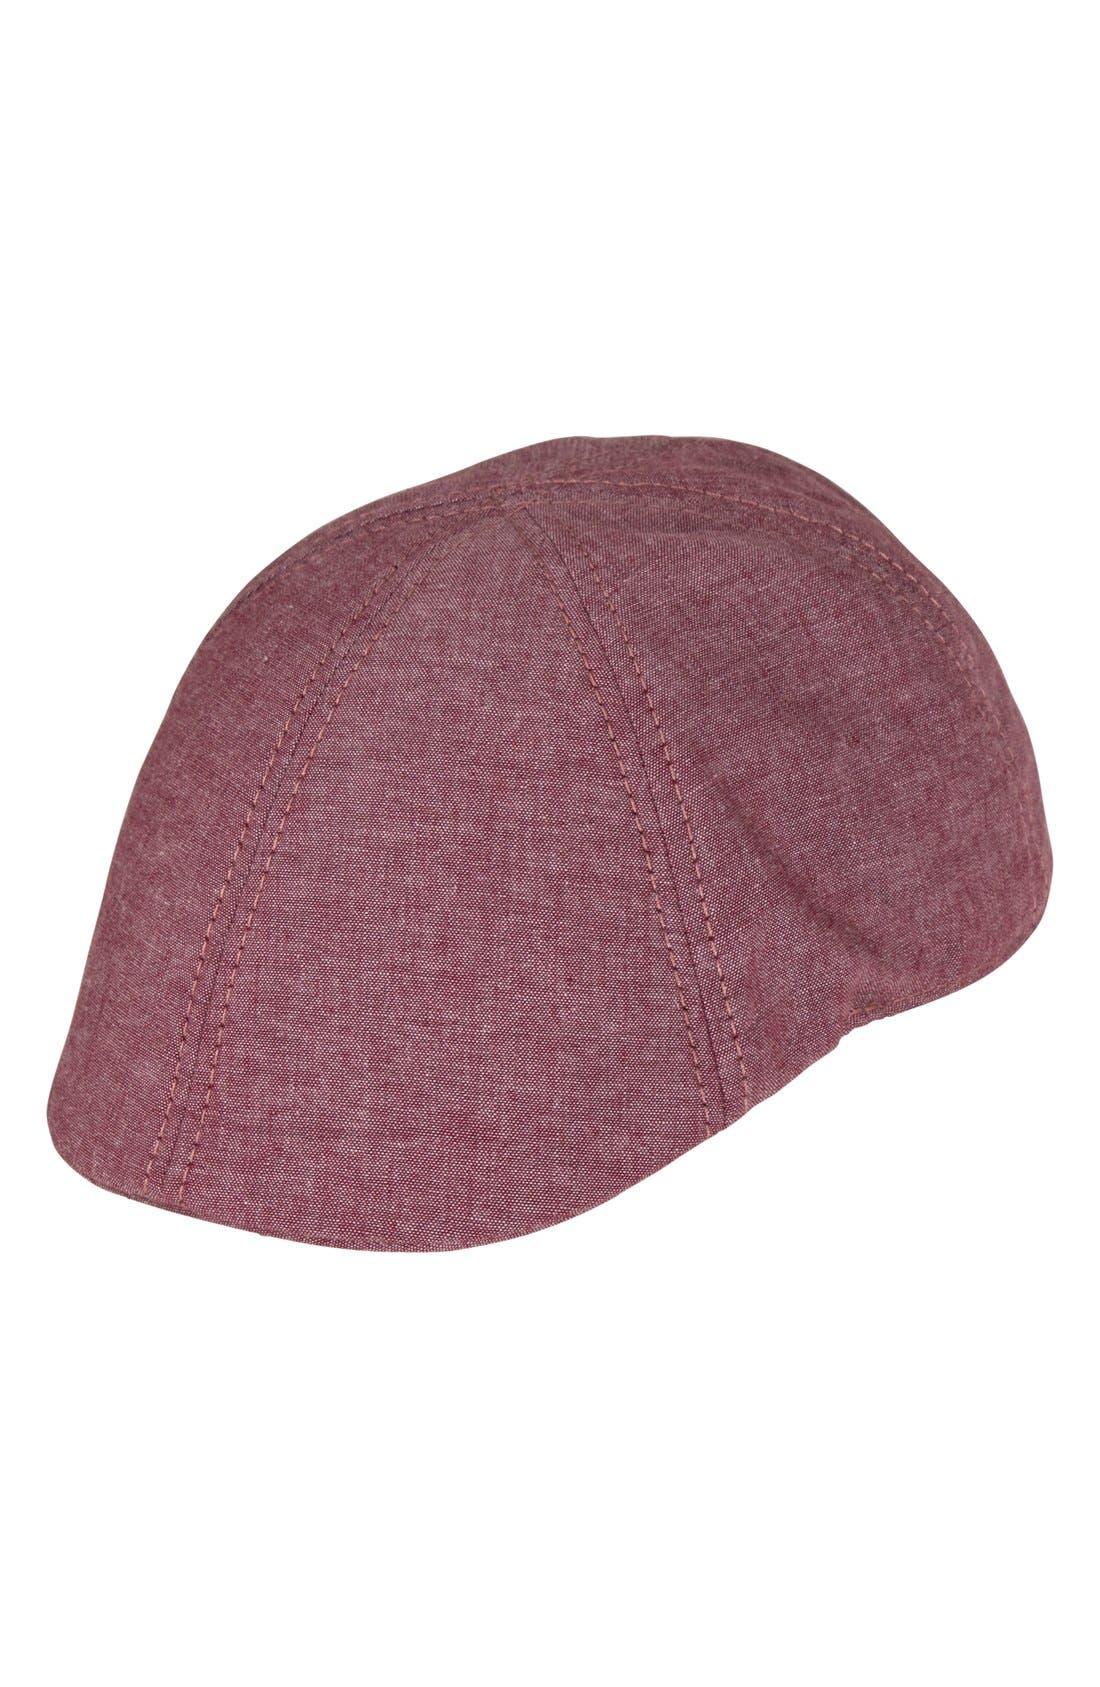 Men's Goorin Brothers Mr. Bang Driver's Hat